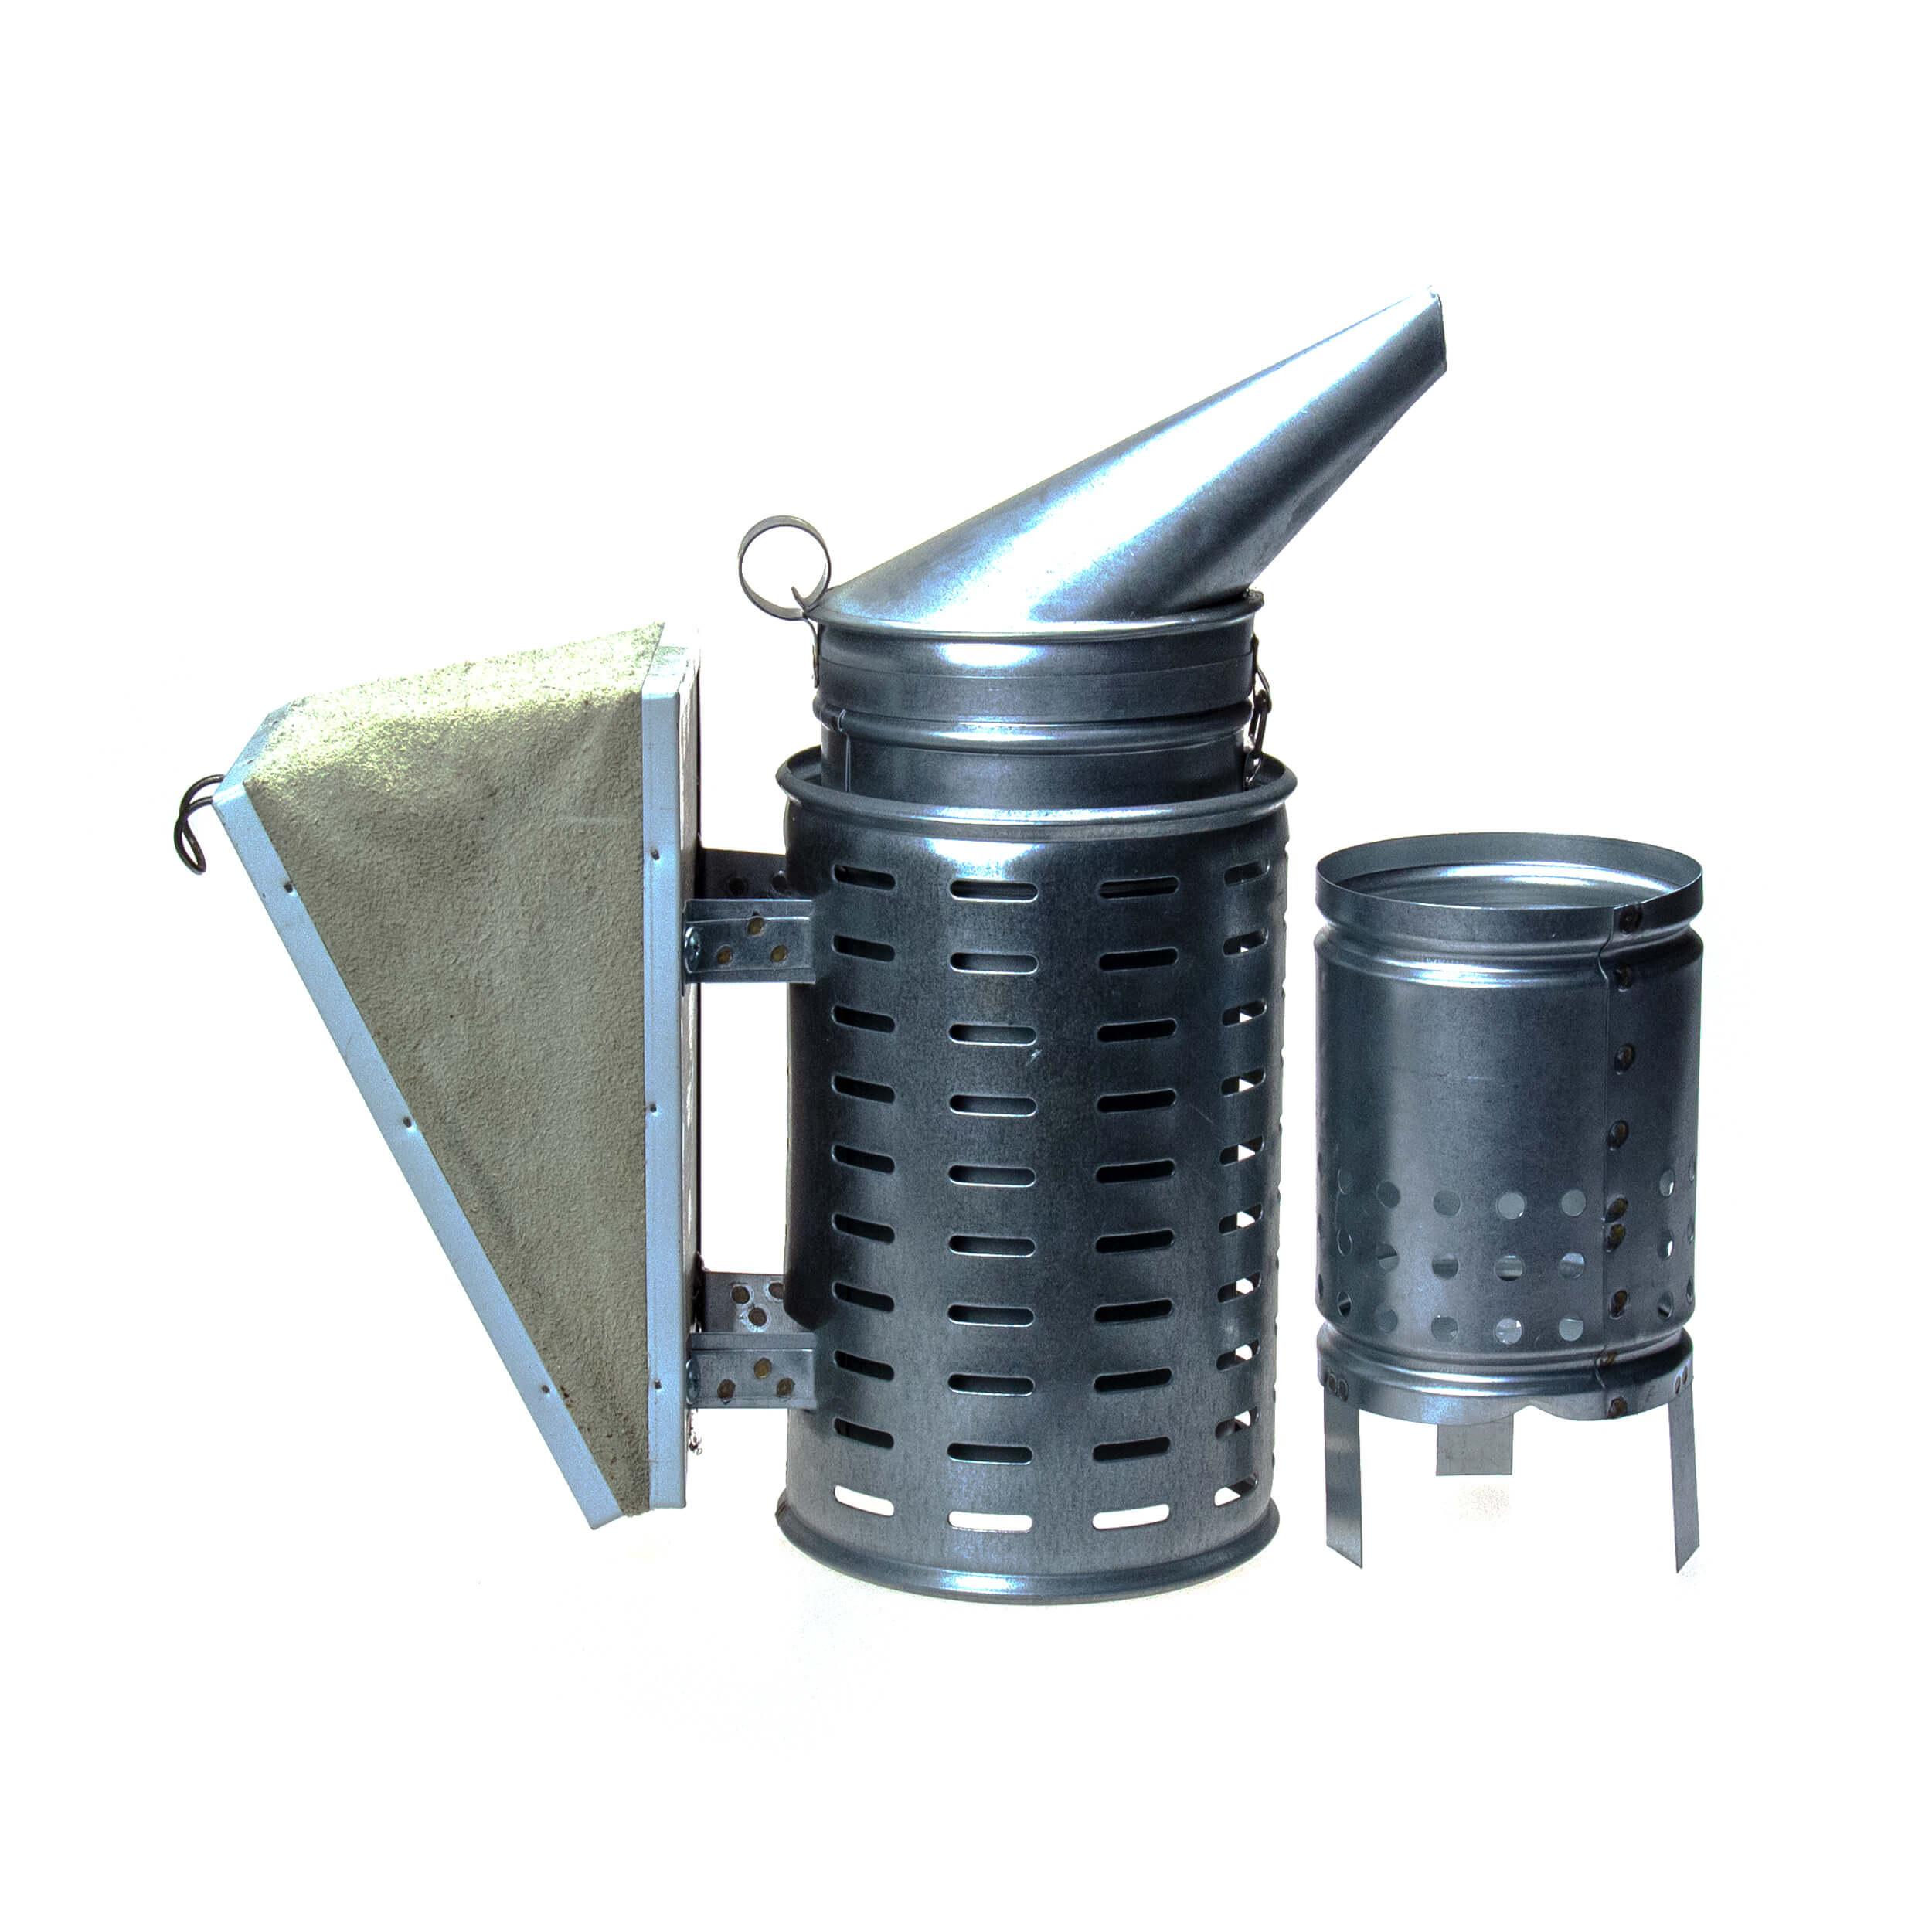 "Дымарь для пчел ""BF-DPO-3"" (оцинковка, макс защита, стакан) фото"